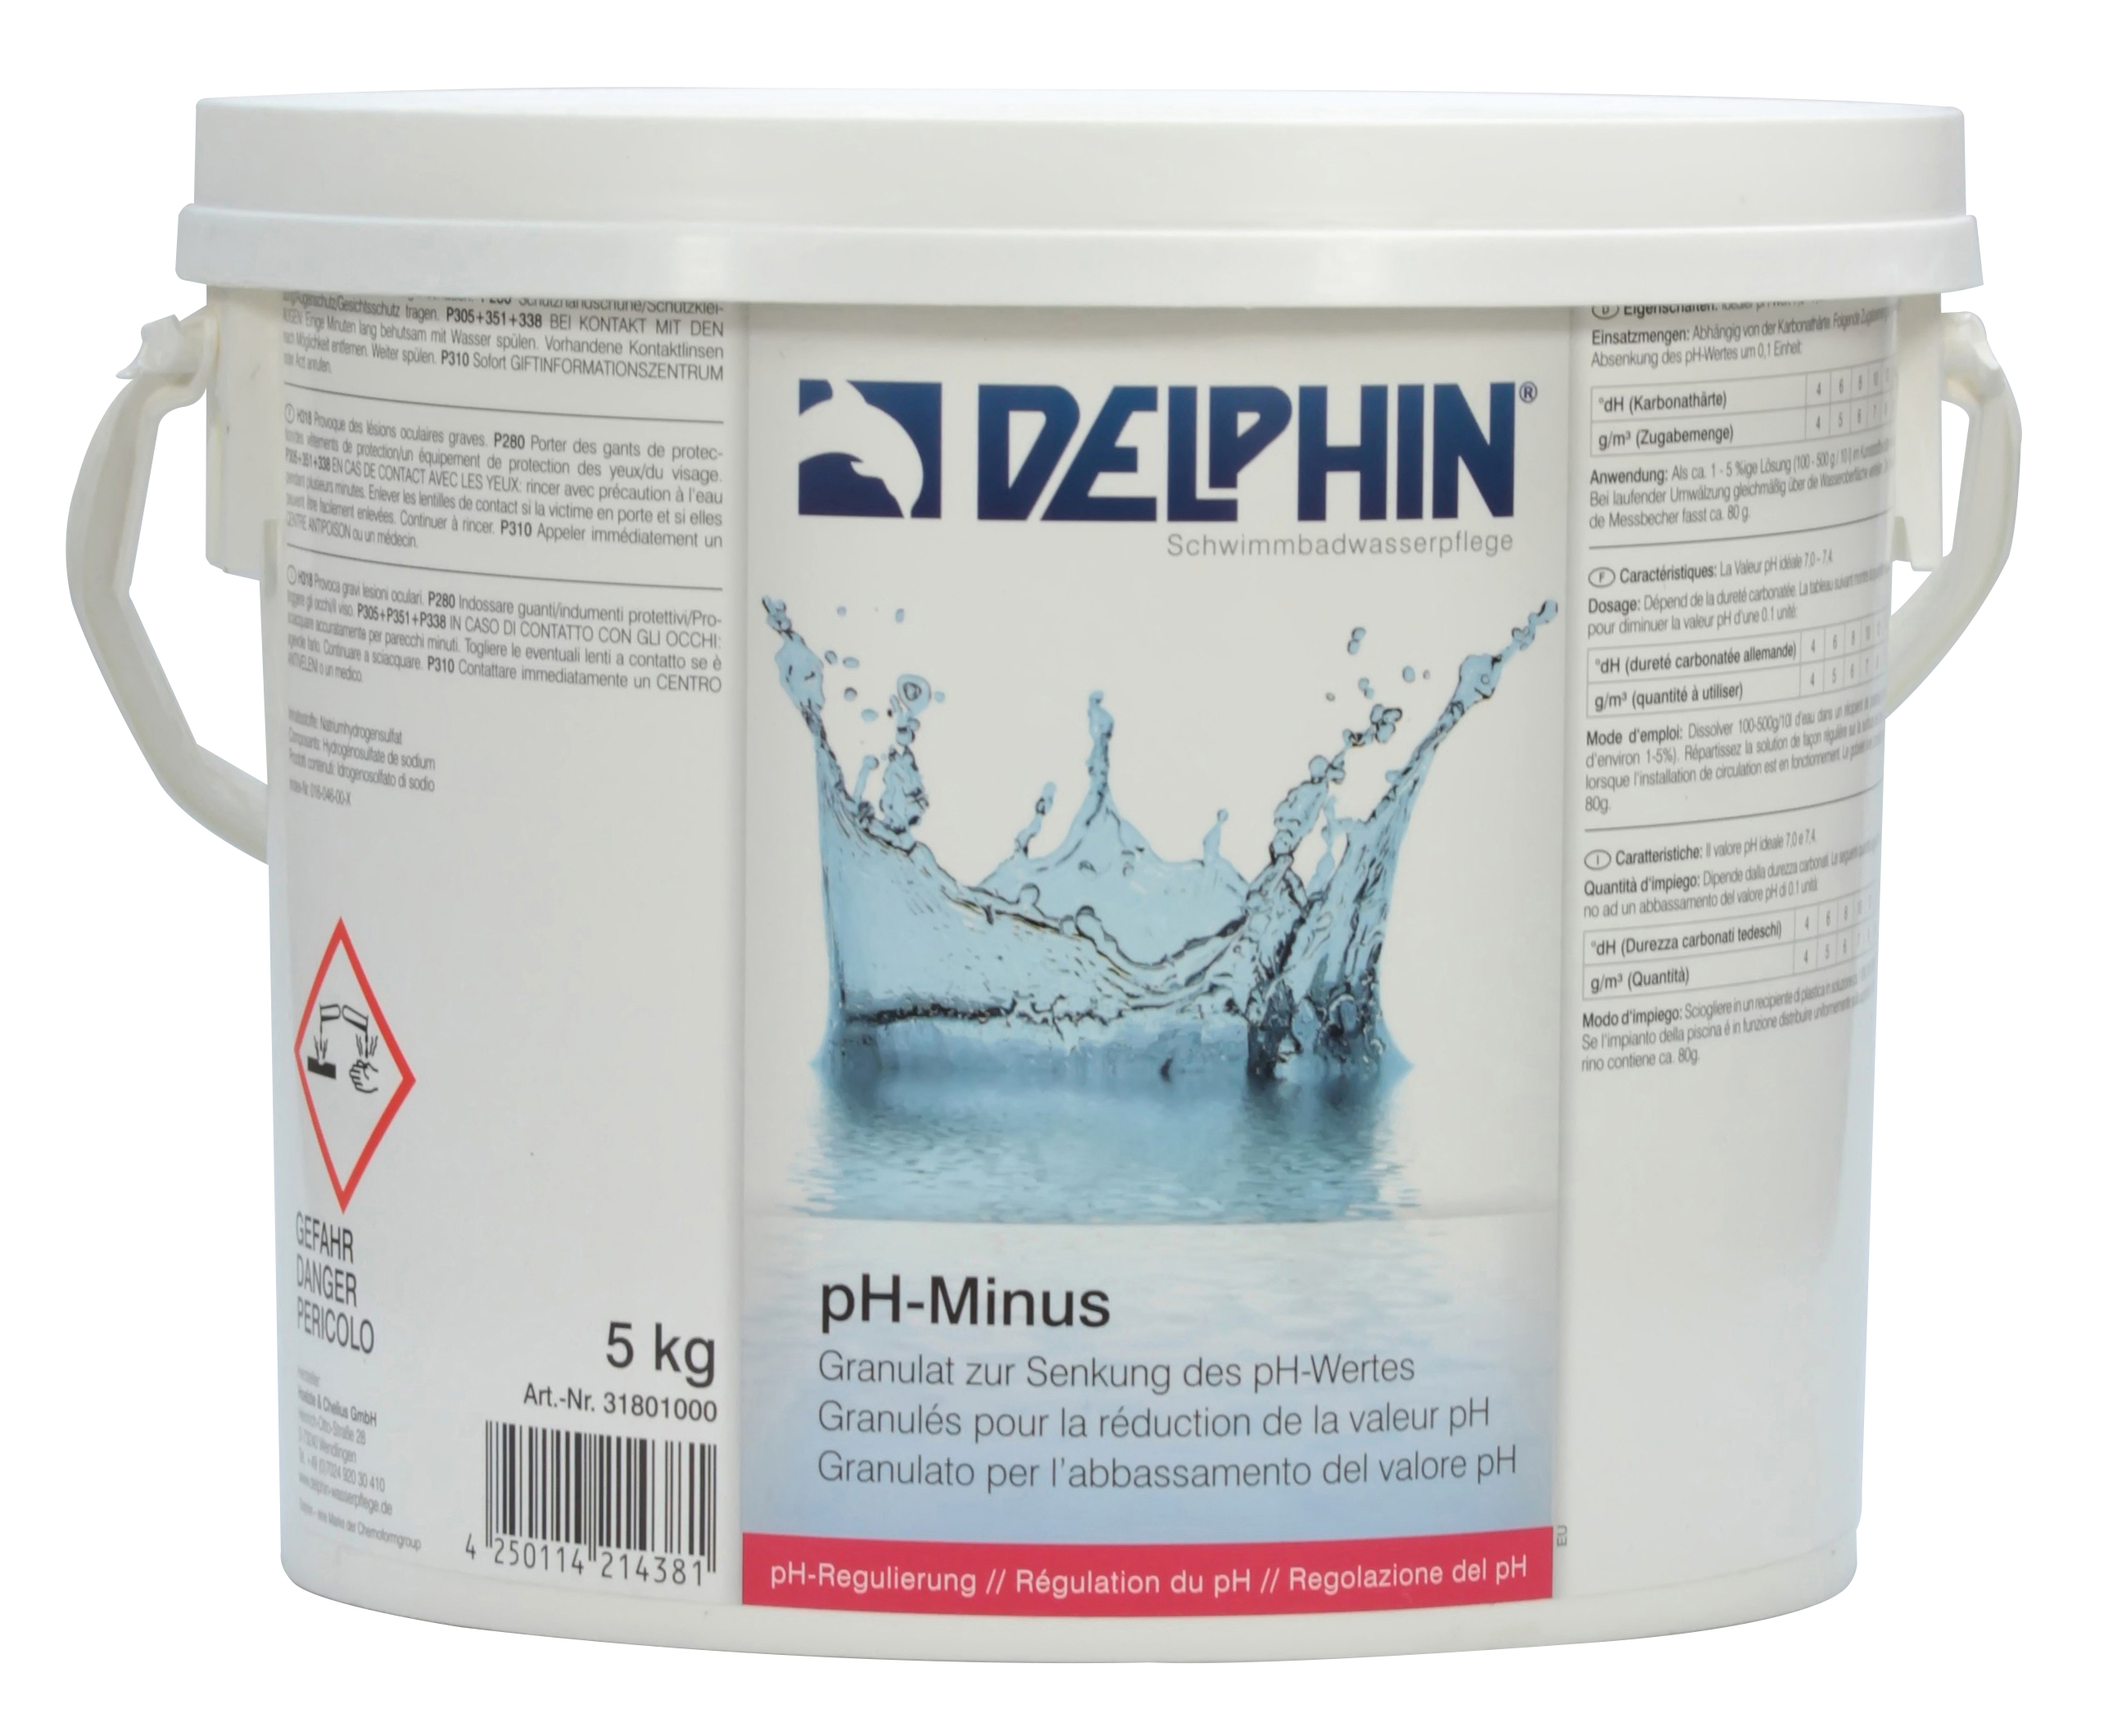 delphin ph minus senker granulat f r schwimmbad und pool. Black Bedroom Furniture Sets. Home Design Ideas